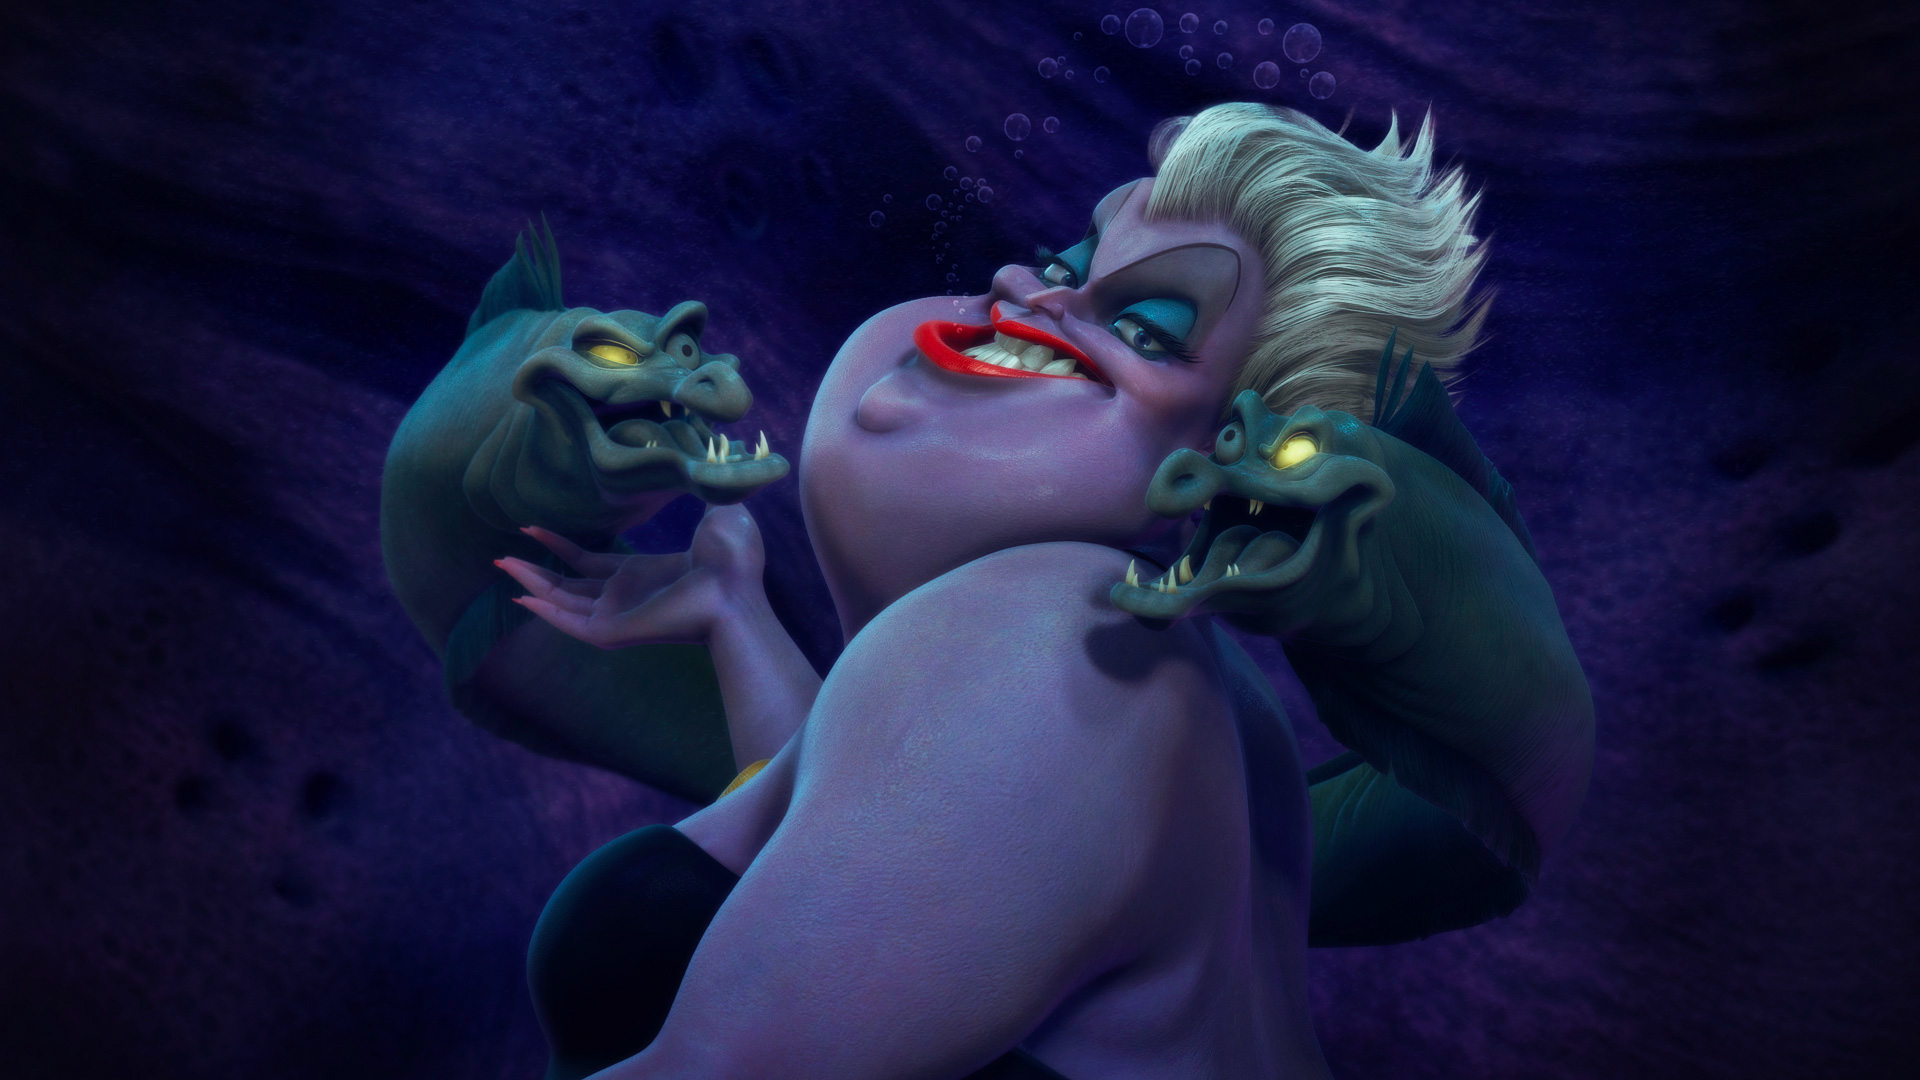 Ursula, Flotsam, and Jetsam